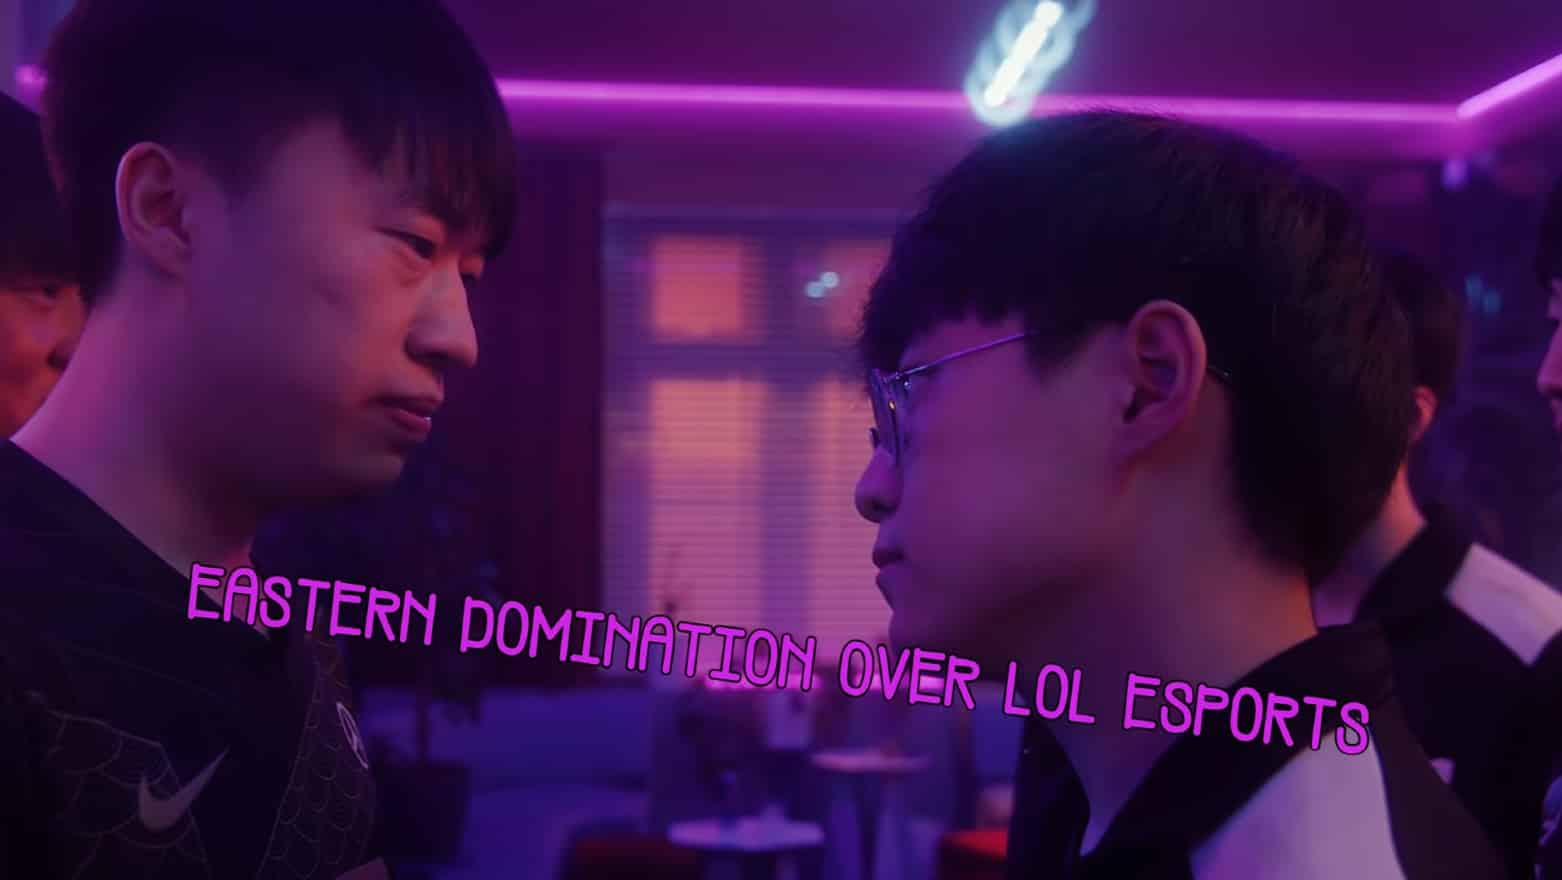 RNG Xiaohu facing off against DK Showmaker | Eastern LoL Dominance